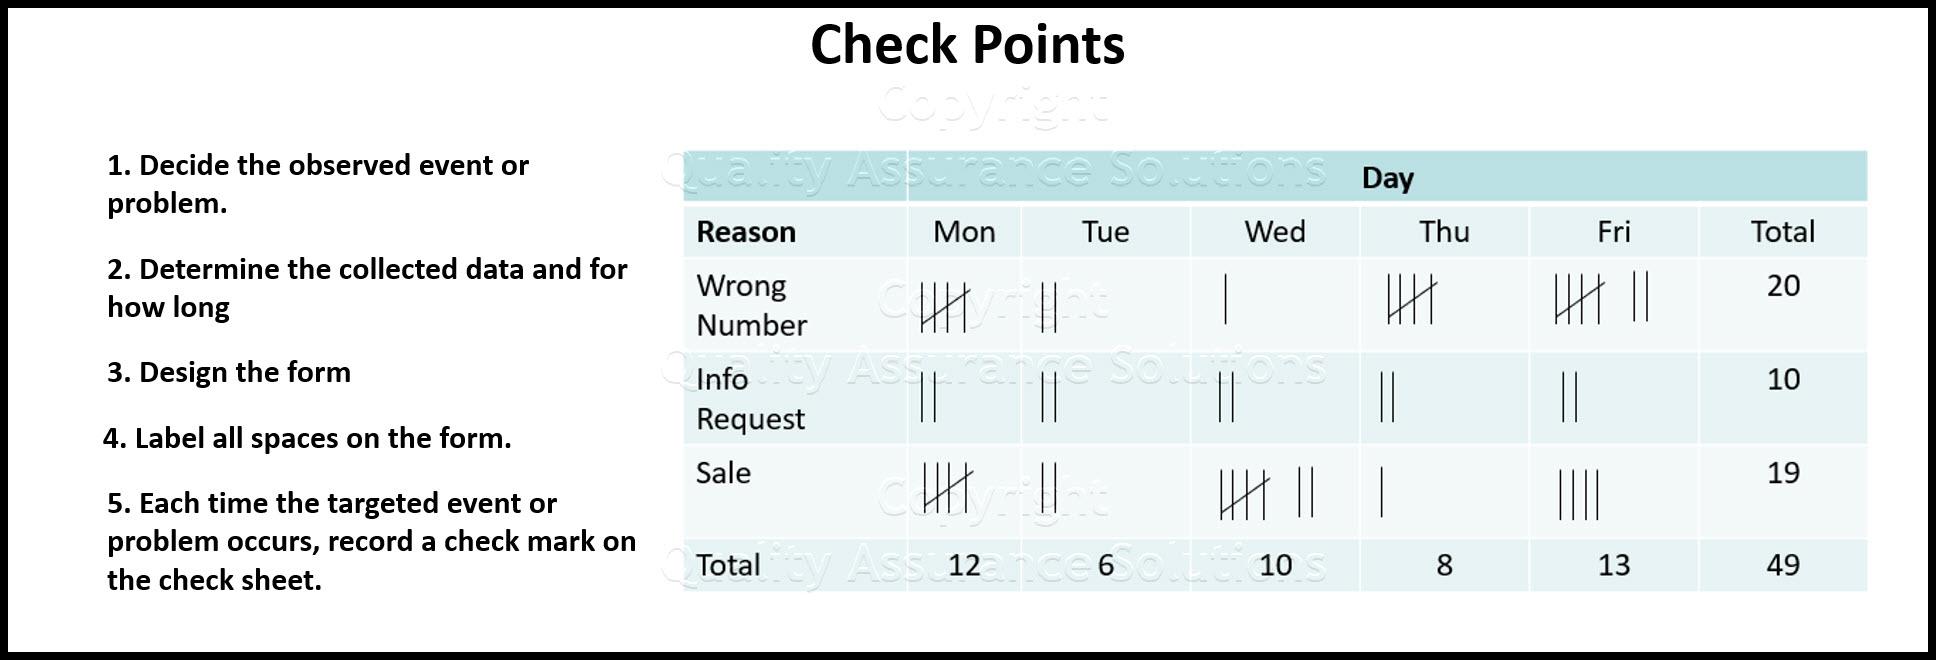 Check points slide